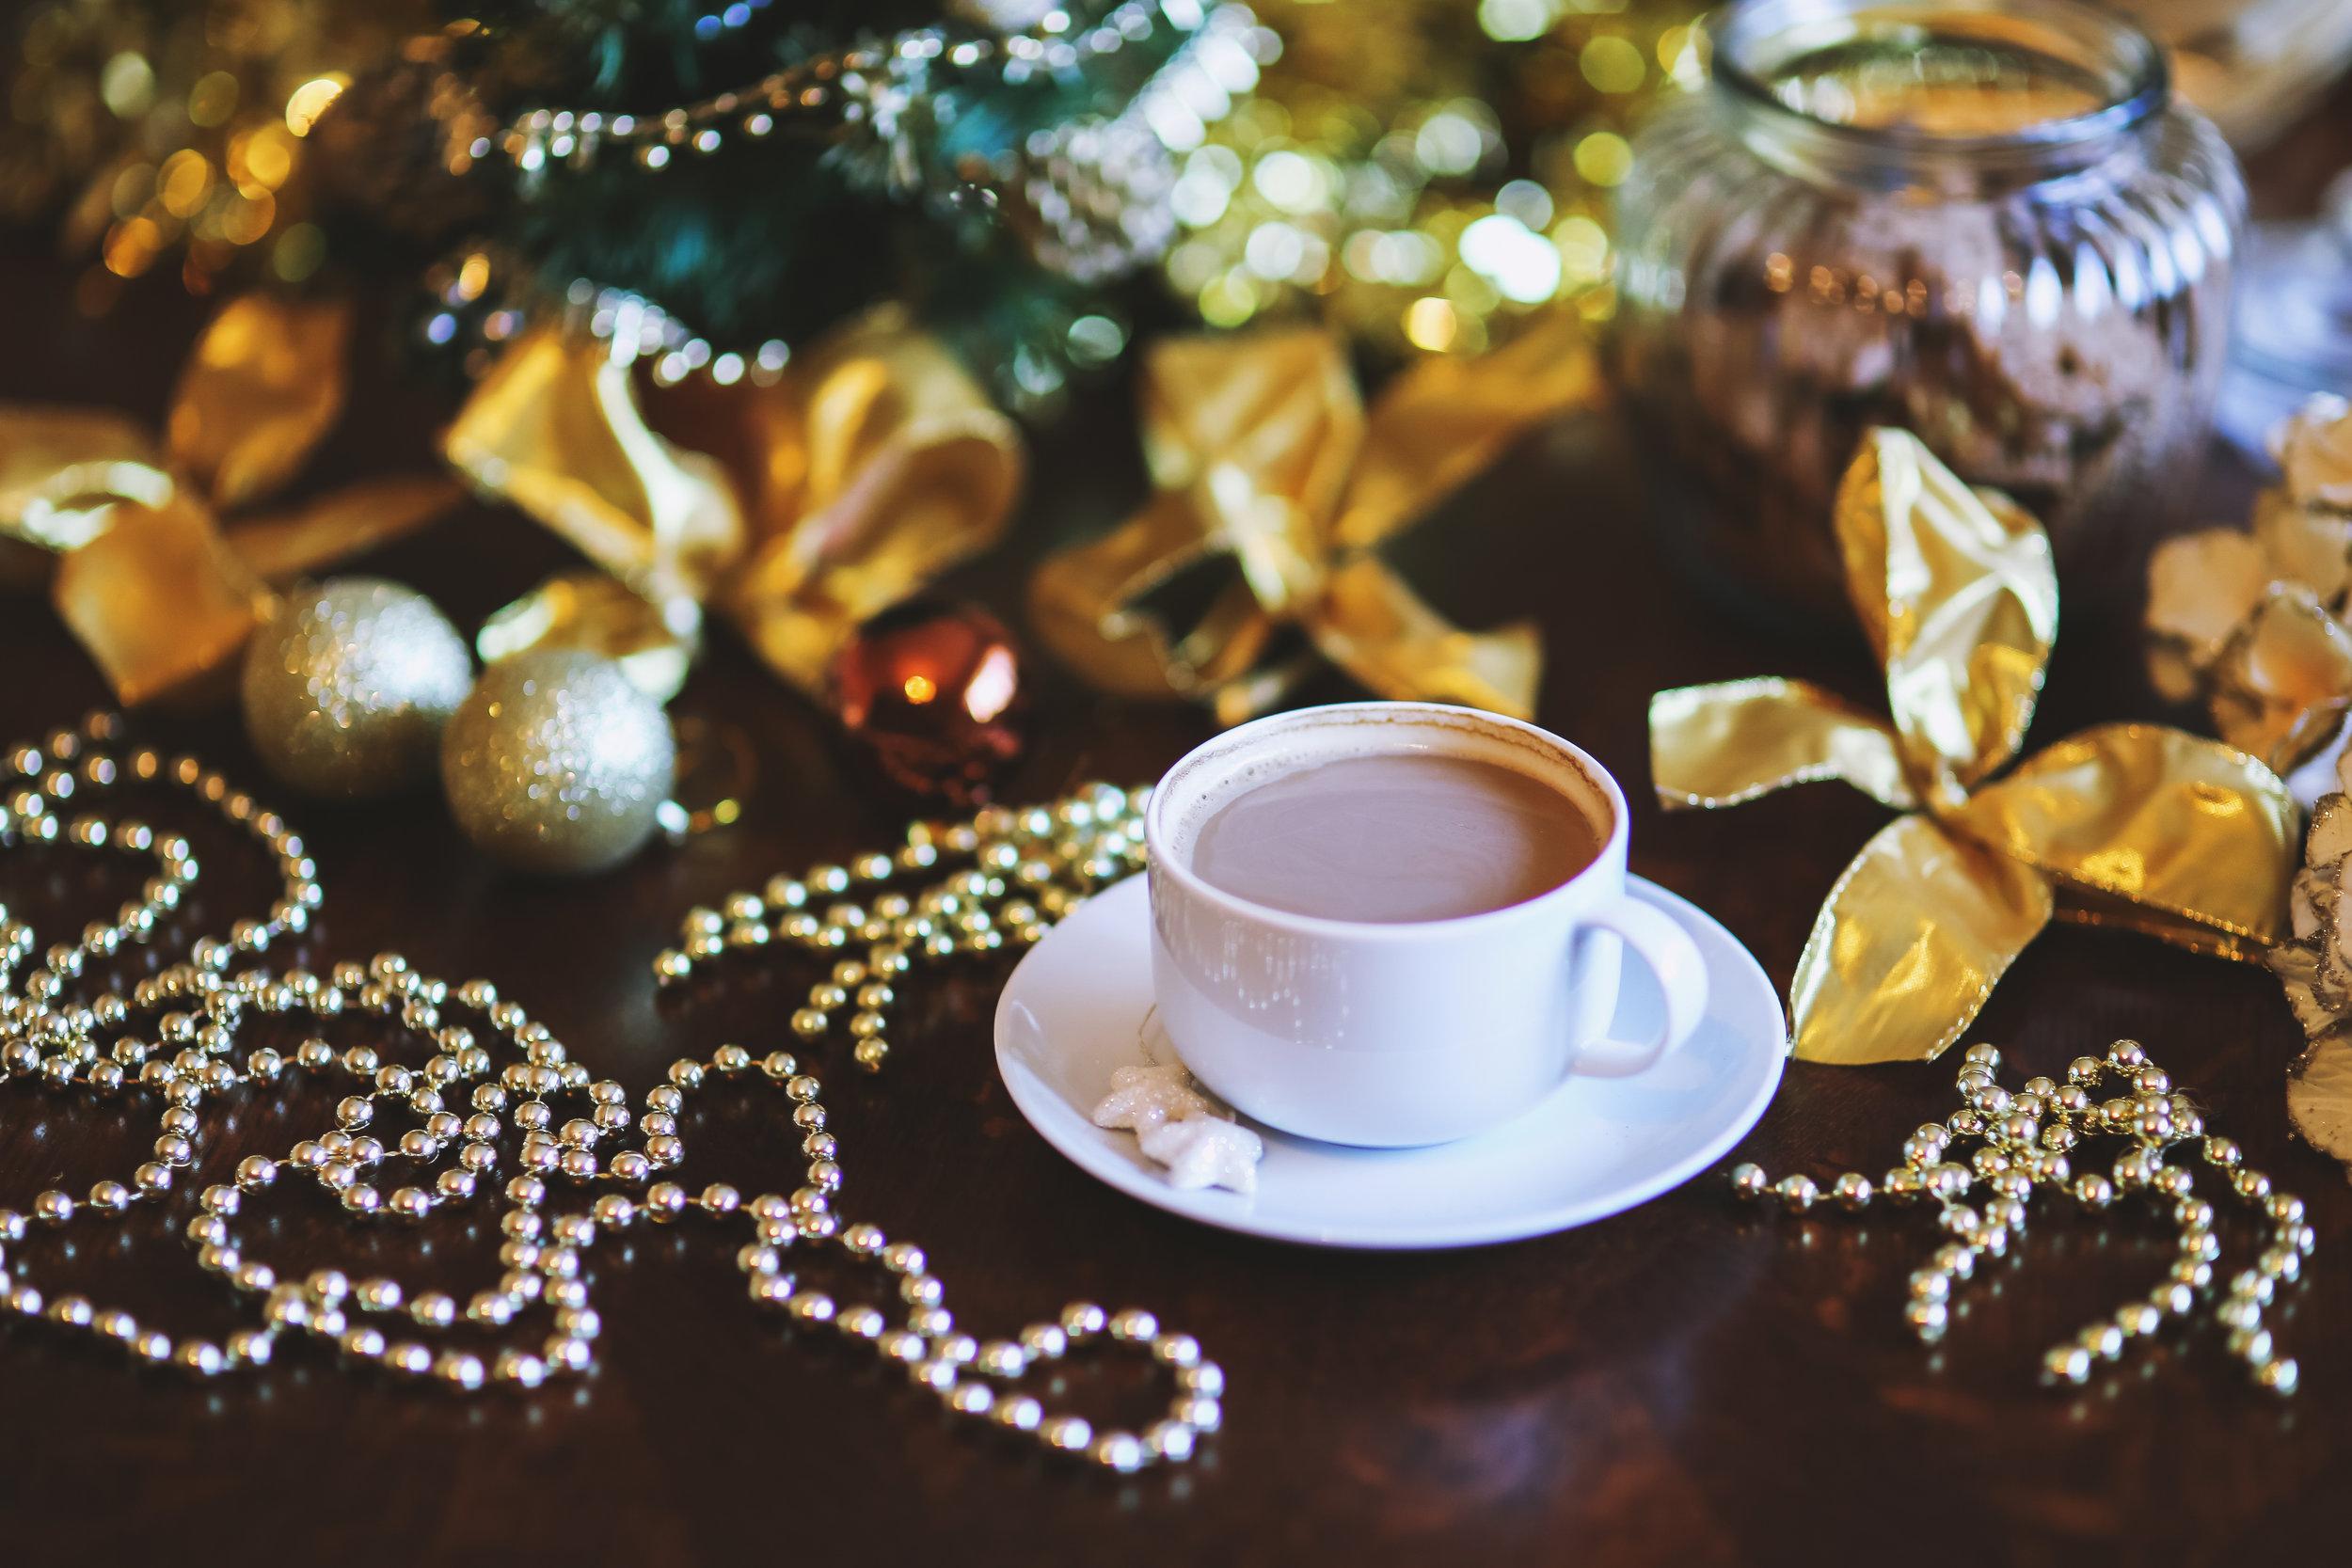 coffee-cup-mug-white-6296.jpg